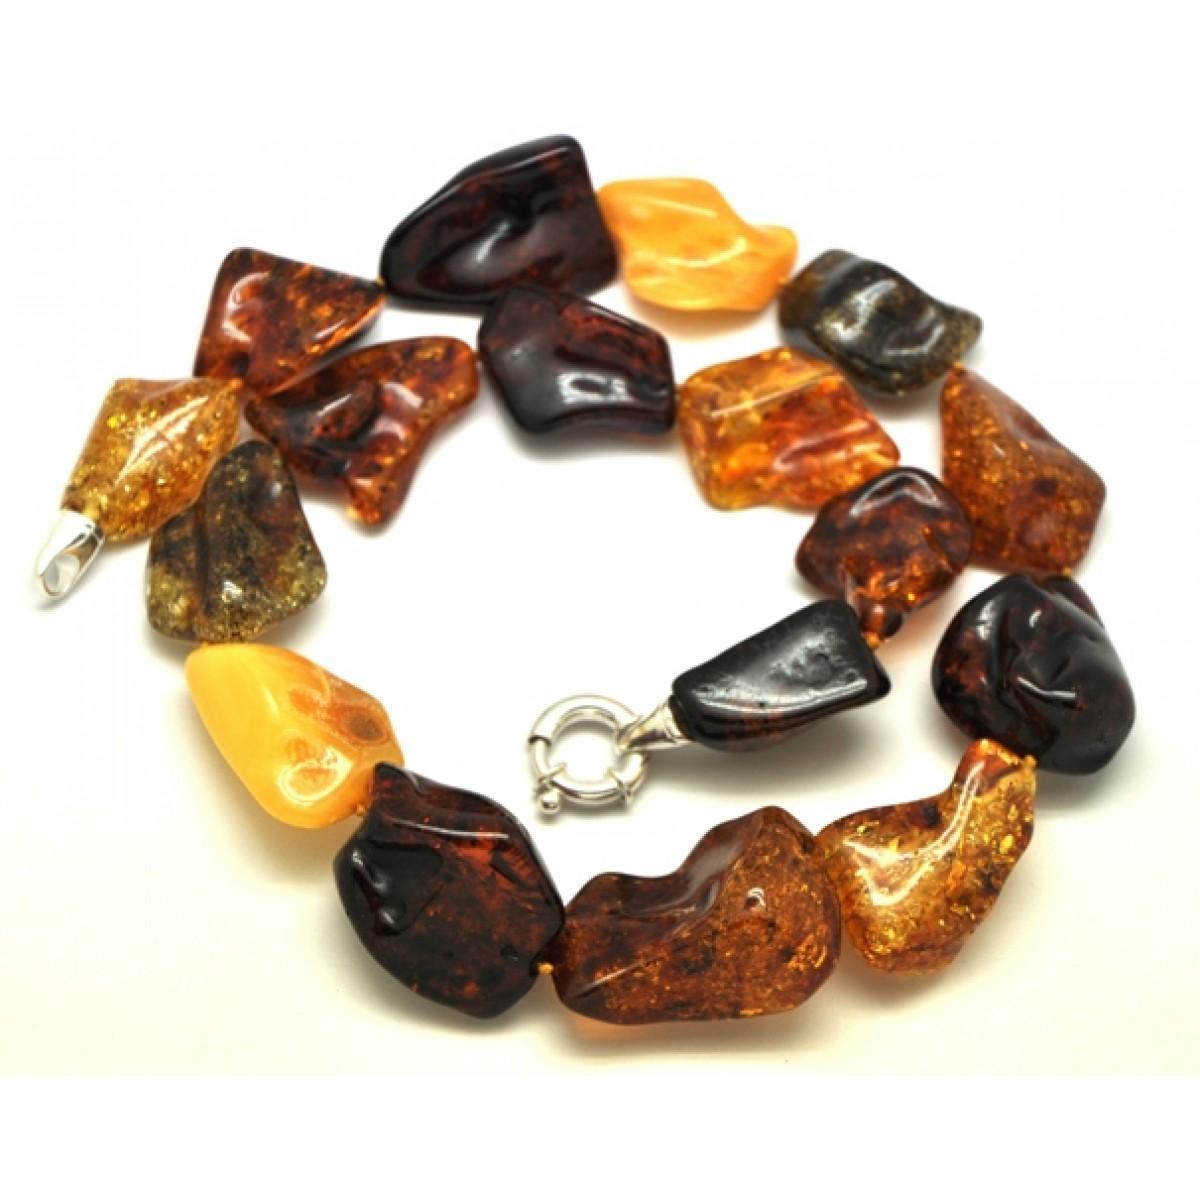 Natural shapes multicolor baltic amber necklace 8127 fine natural shapes multicolor baltic amber necklace aloadofball Images